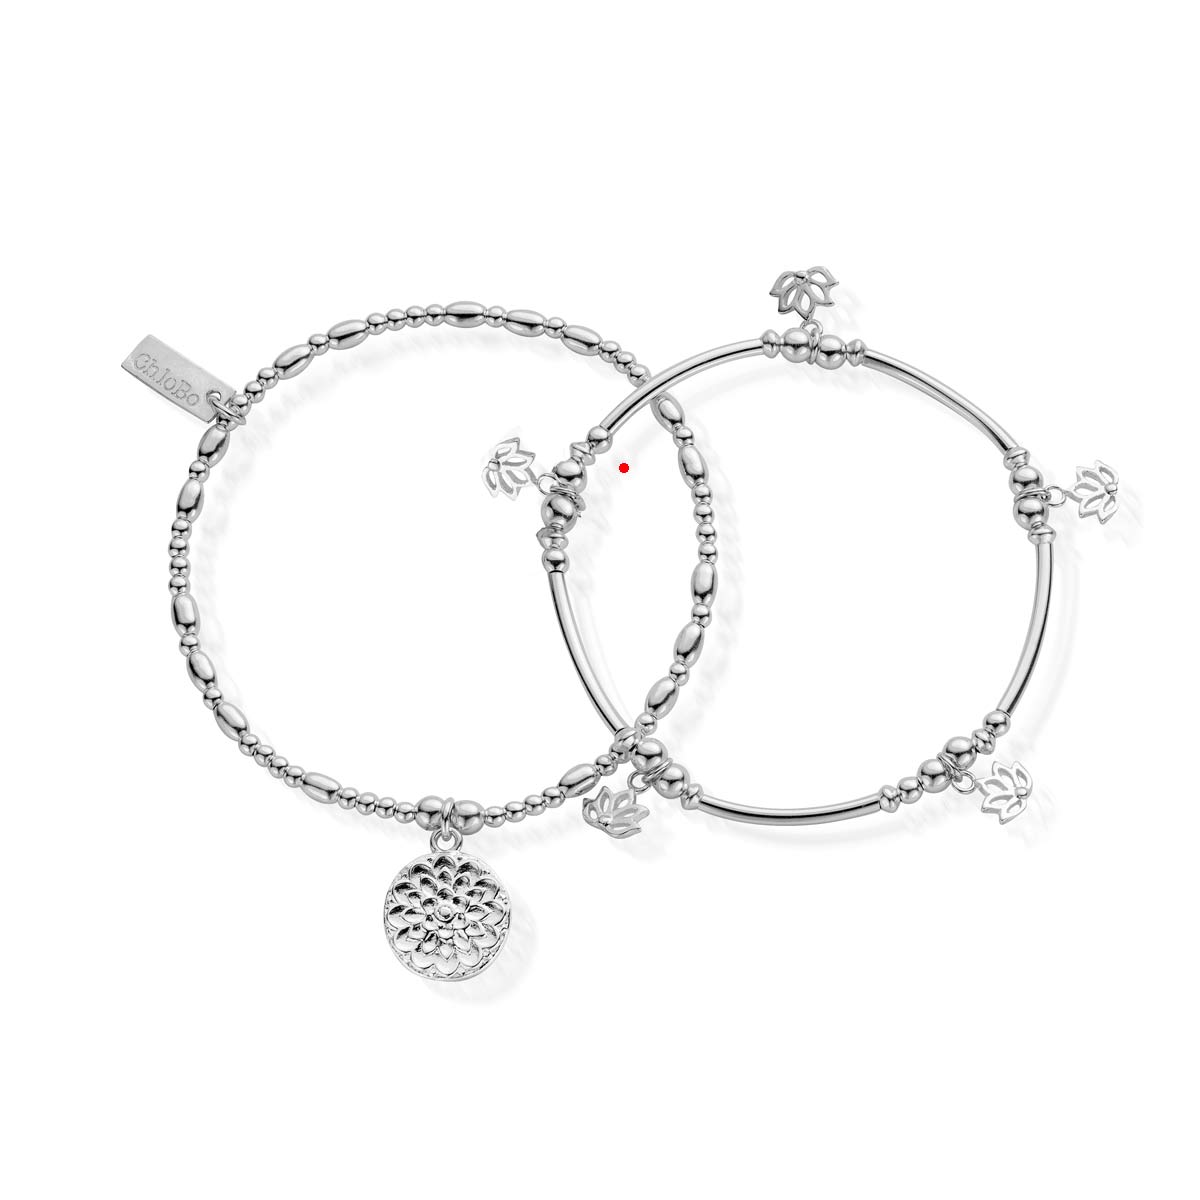 ChloBo CheraBella Jewellery Collection Launch with Chloe Moss